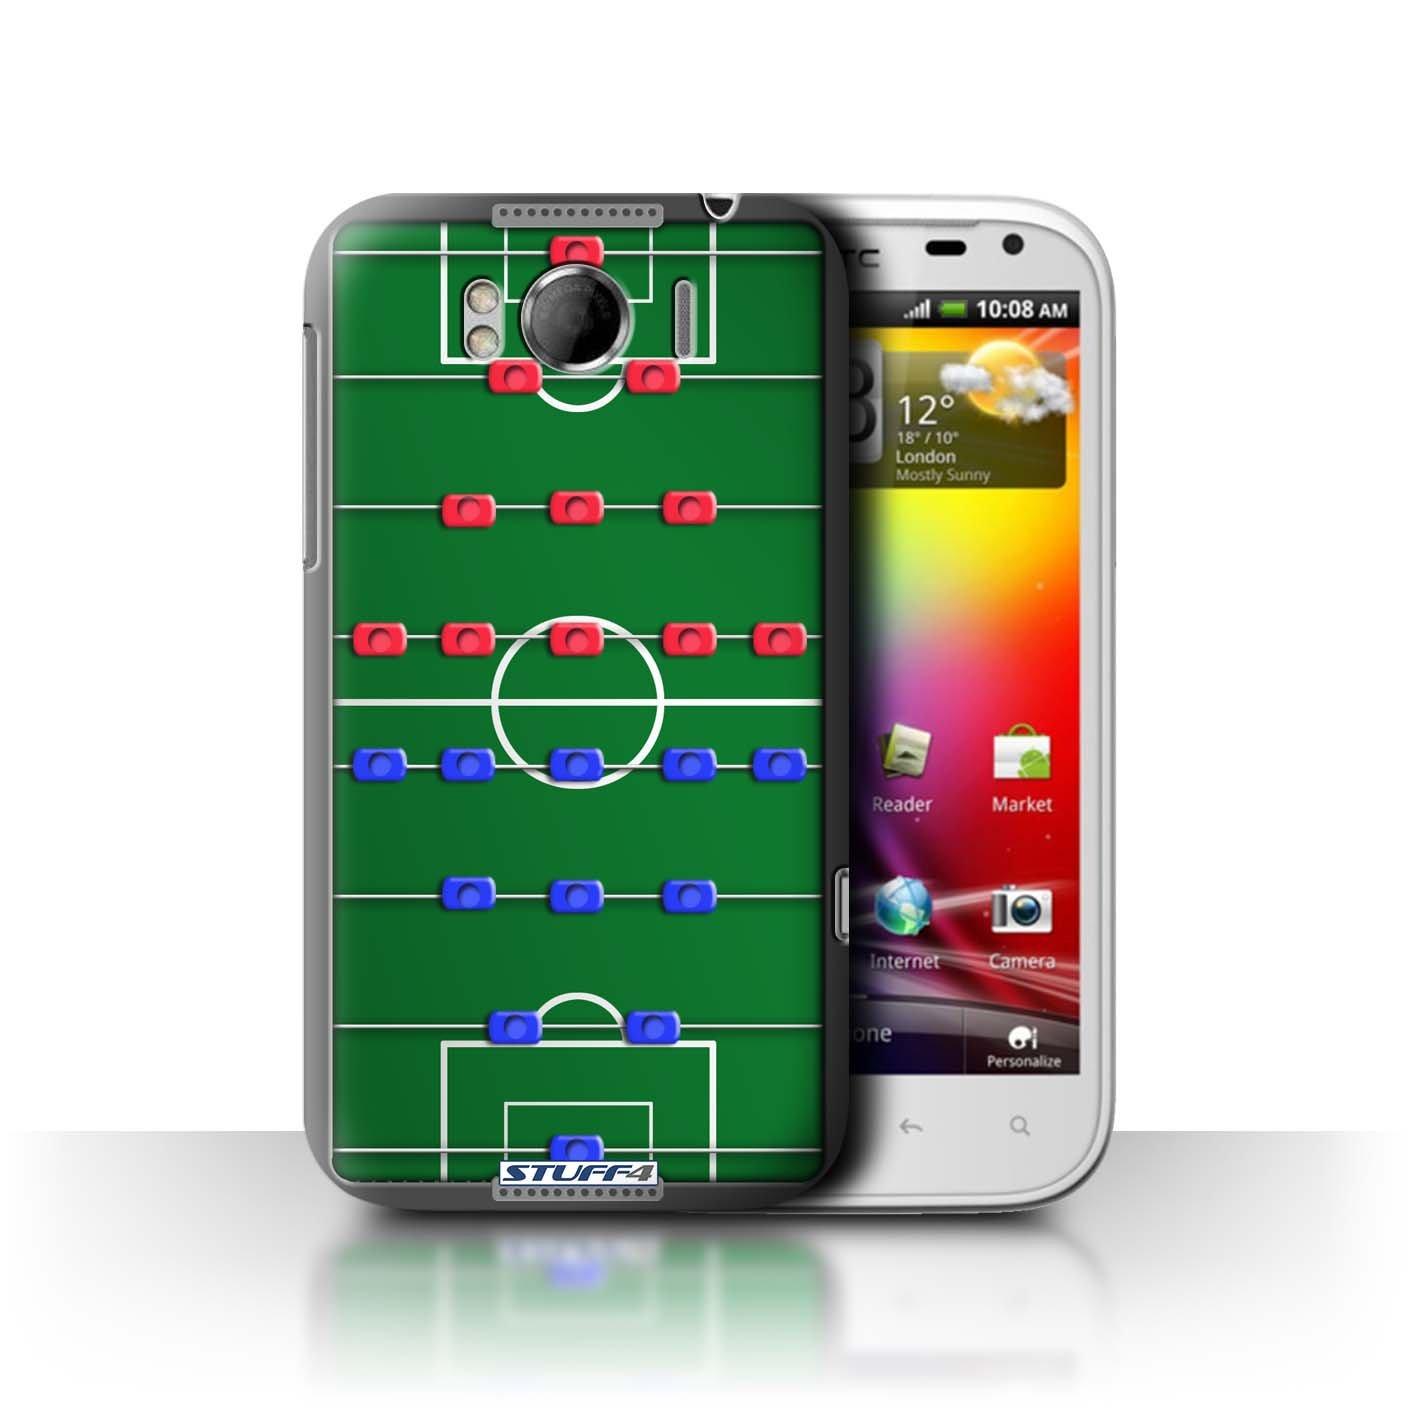 Carcasa/Funda STUFF4 dura para el HTC Sensation XL/G21 / serie ...